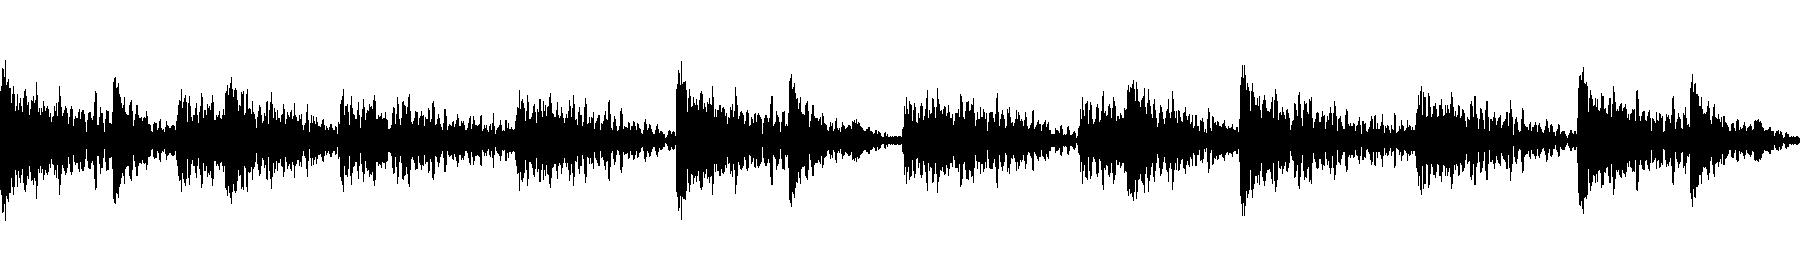 g abs05 068